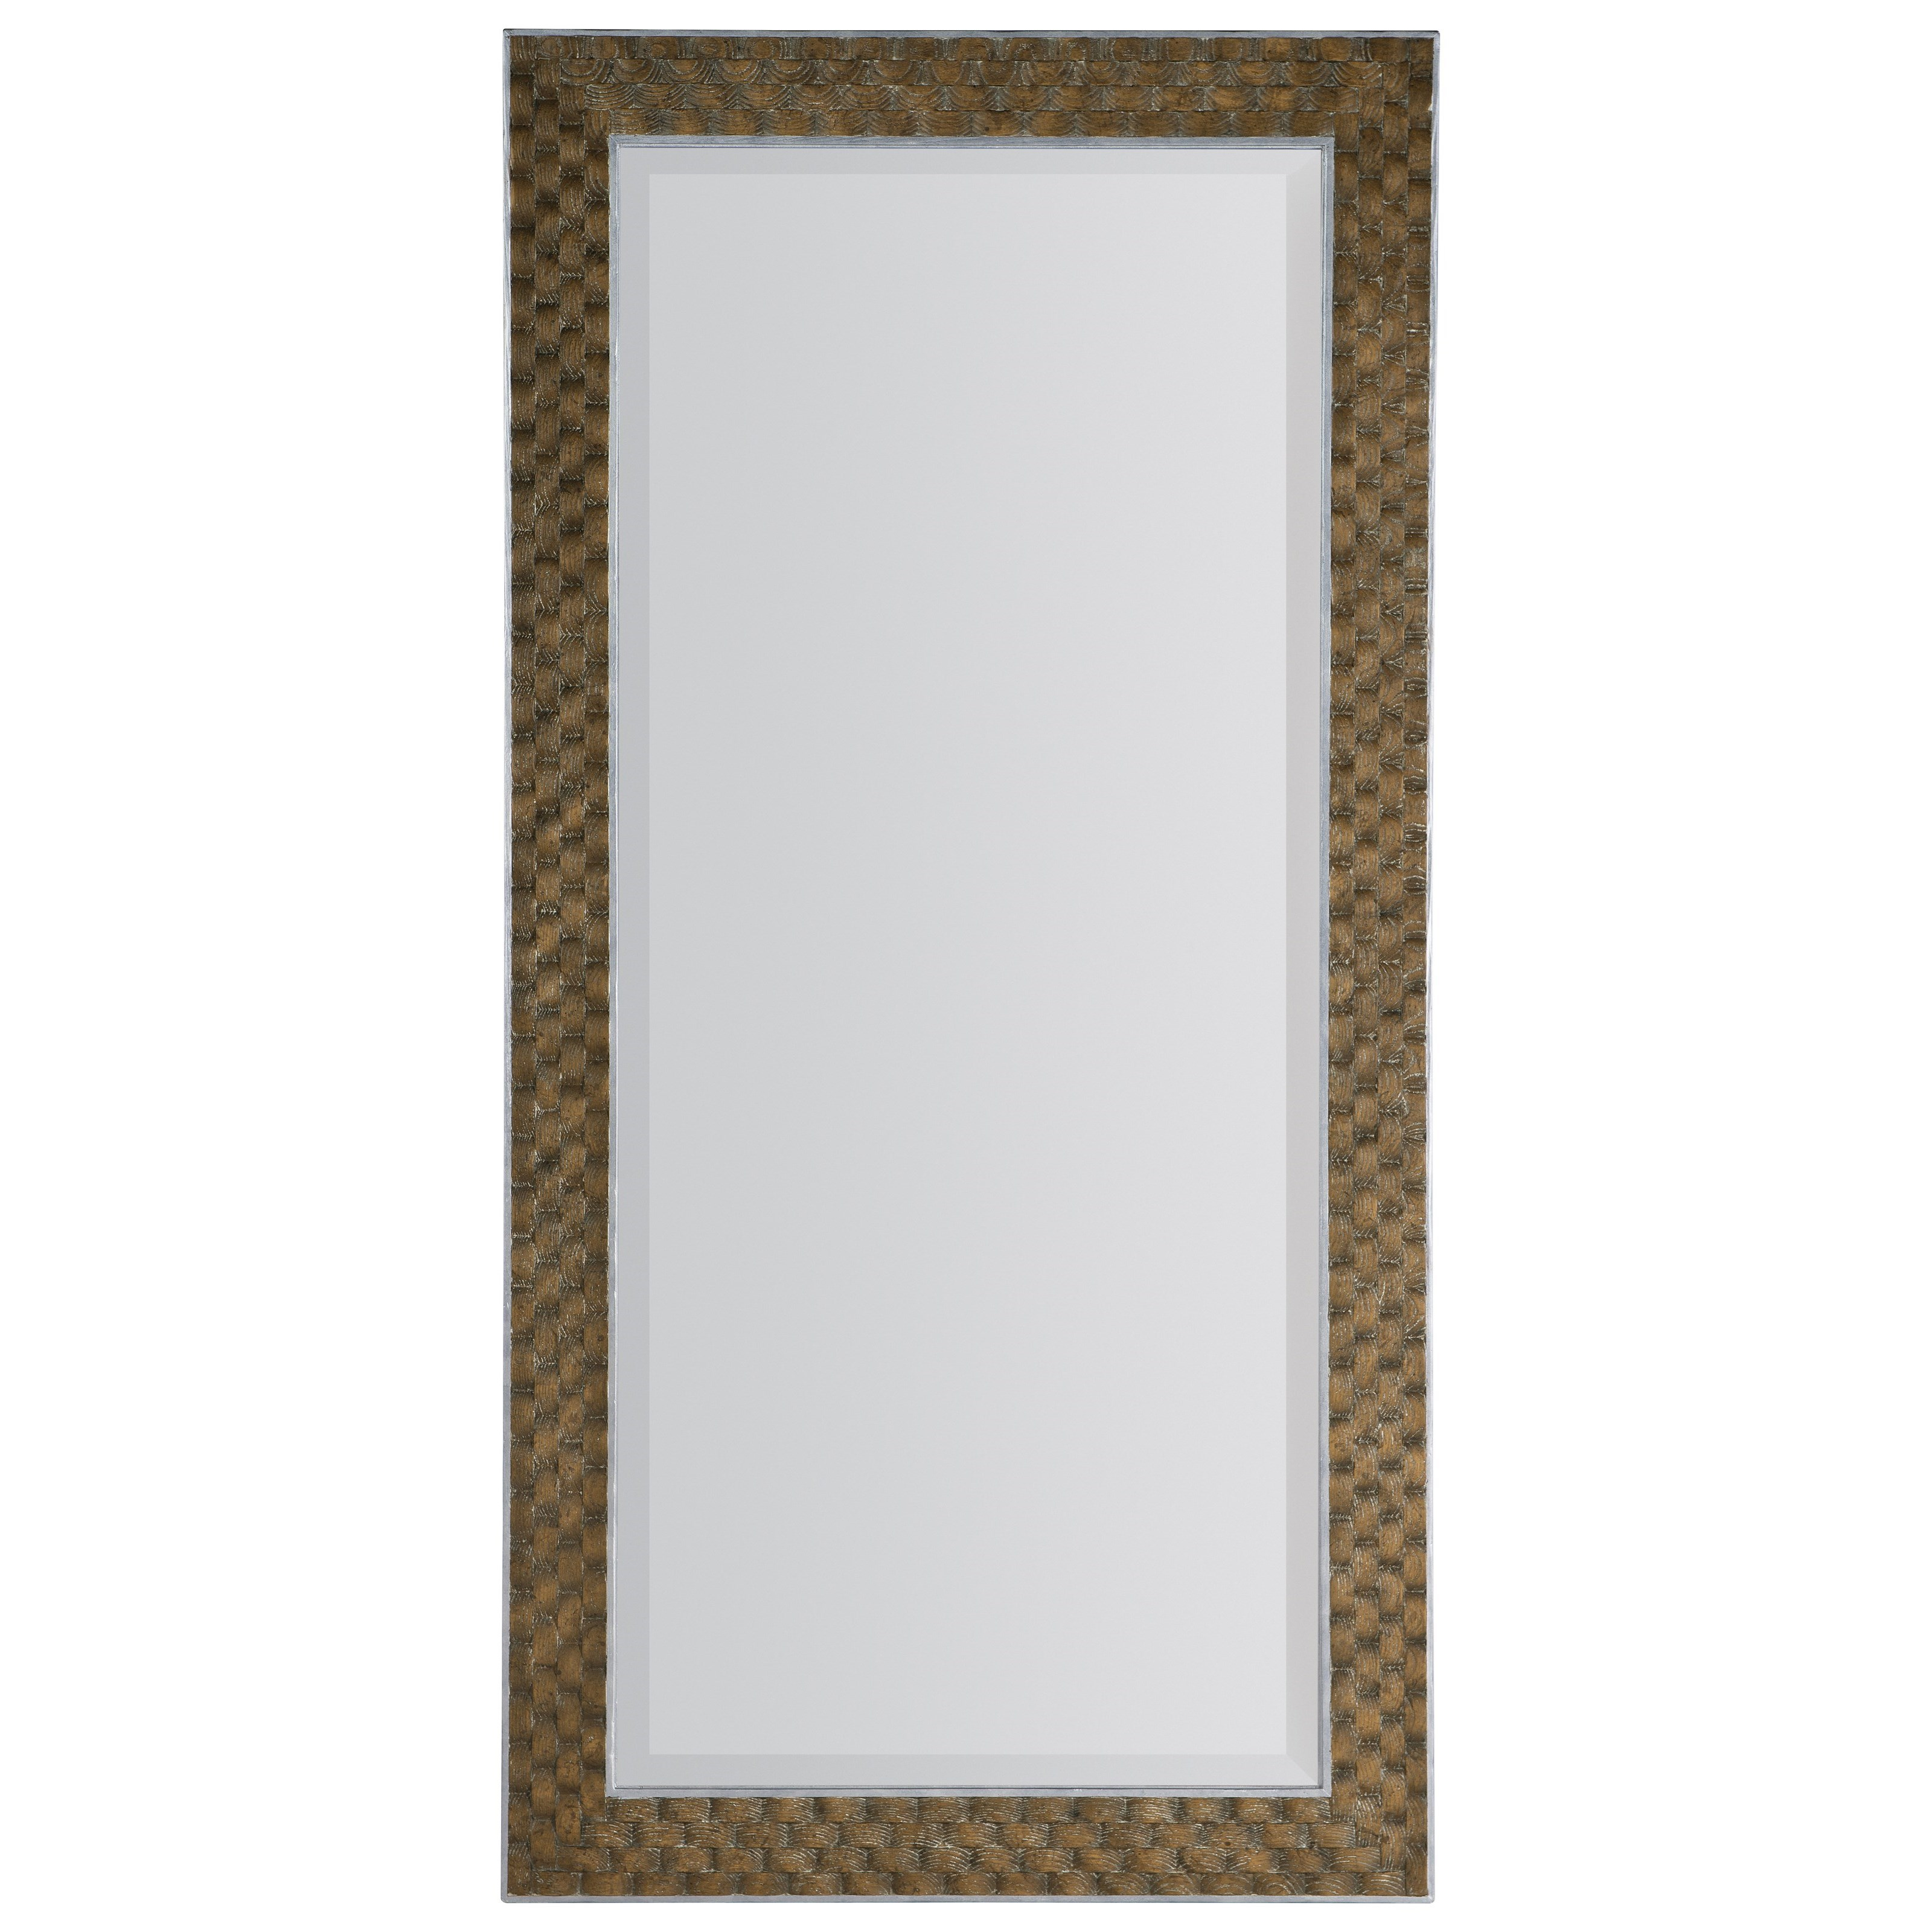 Sundance Floor Mirror by Hooker Furniture at Goods Furniture